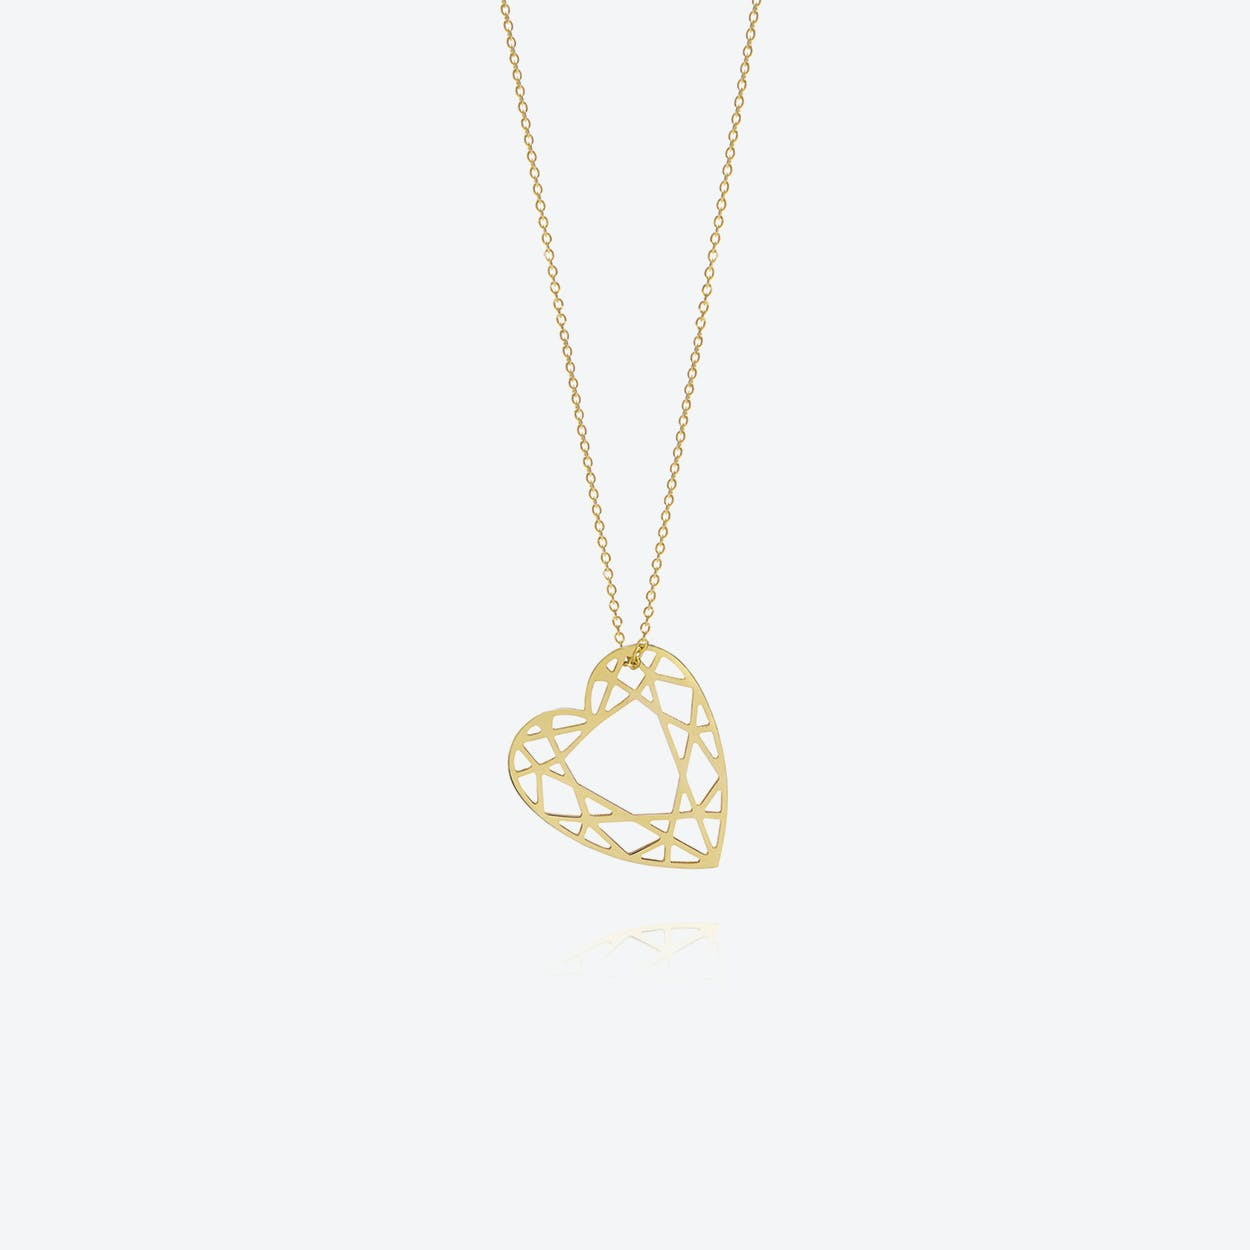 Medium Heart Diamond Necklace in Gold